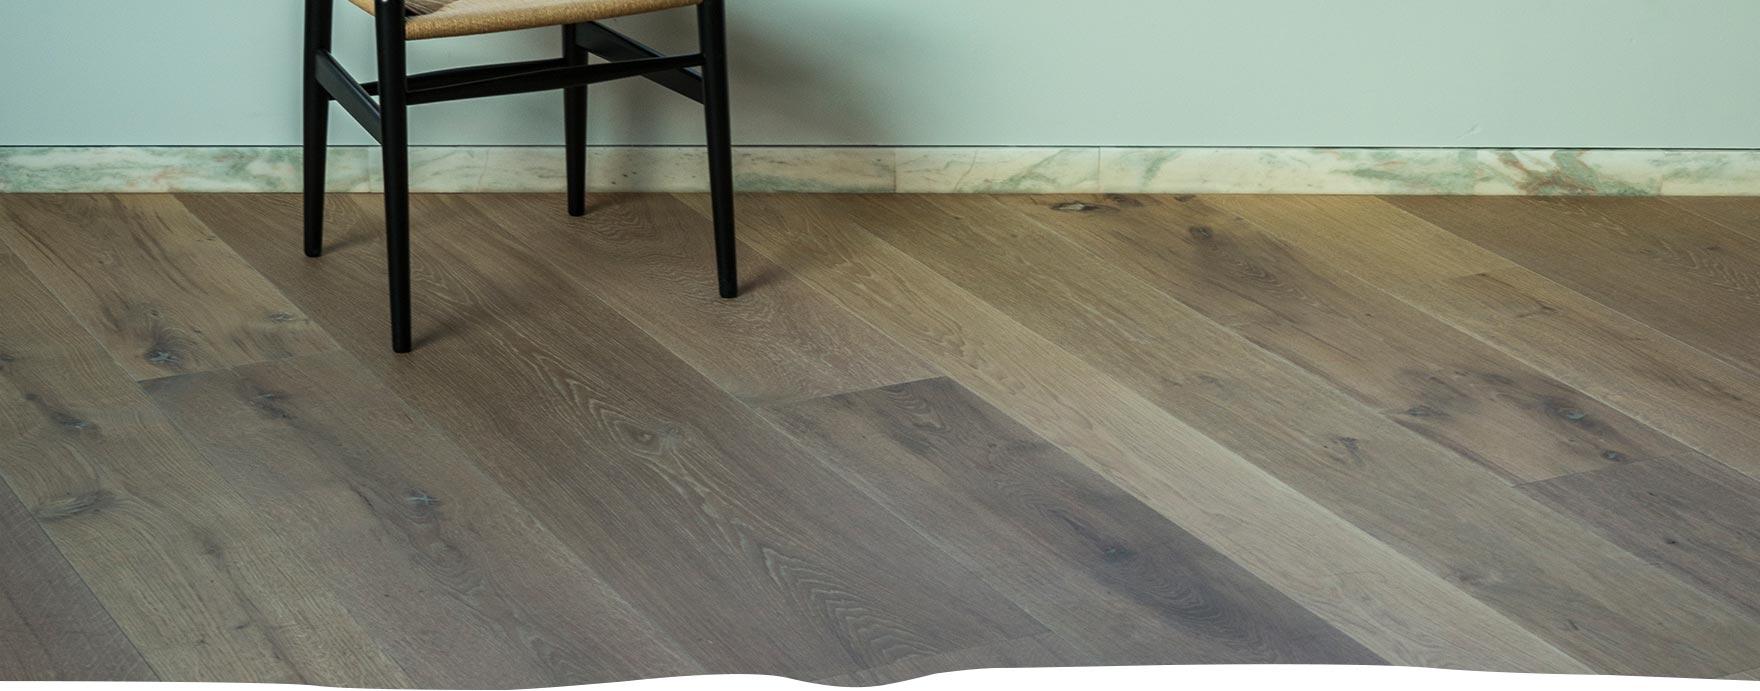 Wisselende breedtes duoplank vloer met vloerverwarming - De Hout Snip